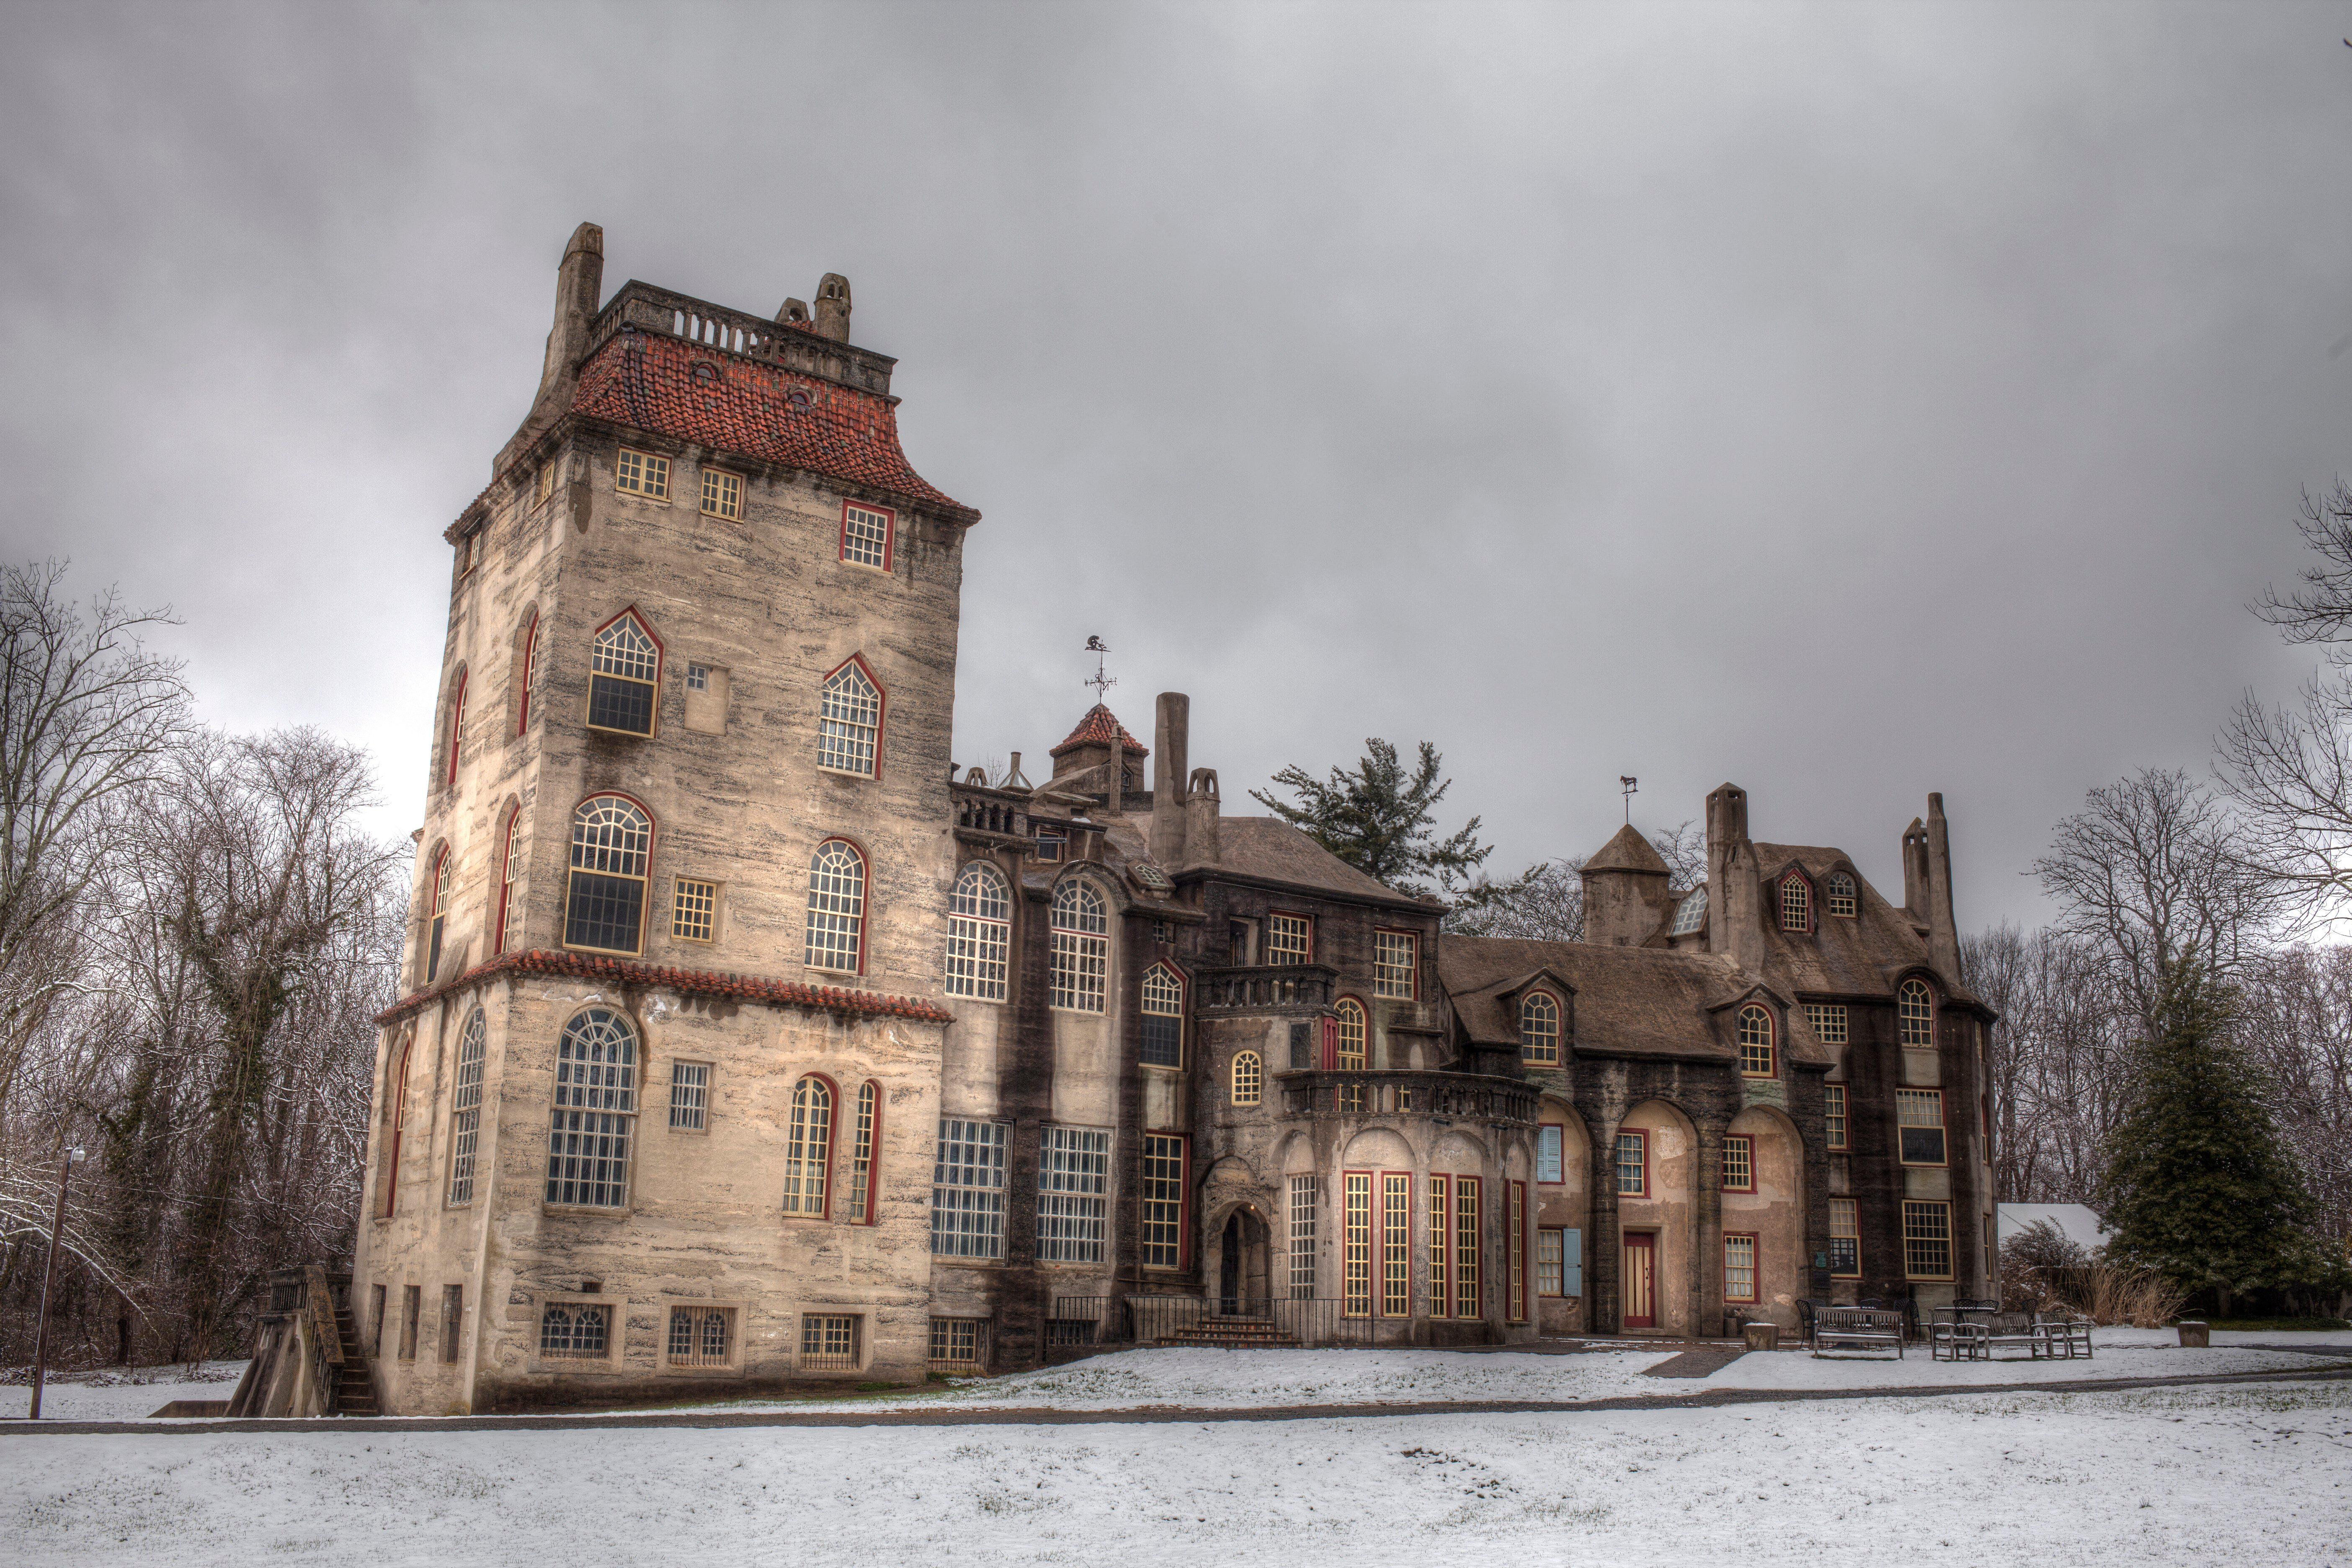 Fonthill castle in Doylestown, Pa. USA